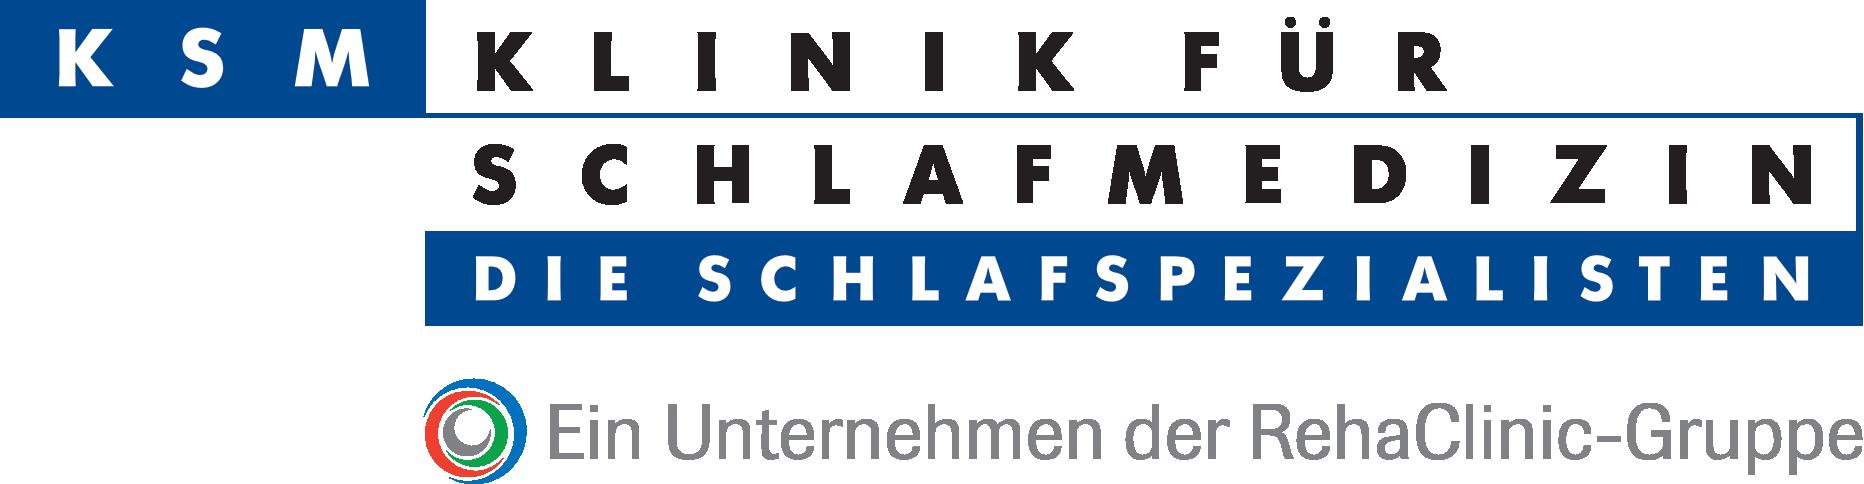 Logo KSM Klinik für Schlafmedizin